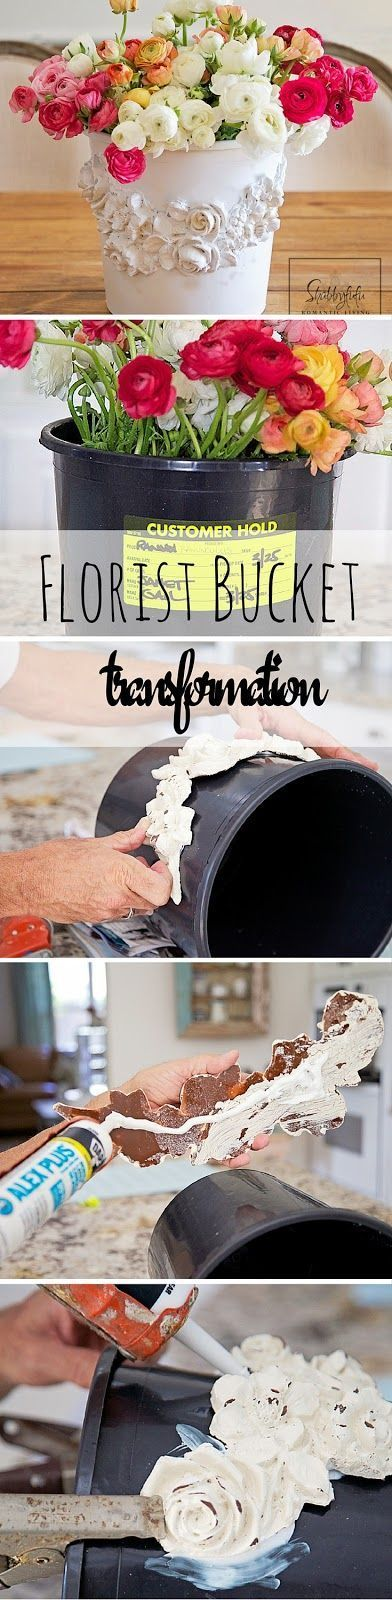 Florist Bucket Transformation...Trash To Treasure Rescue from Shabbyfufu.